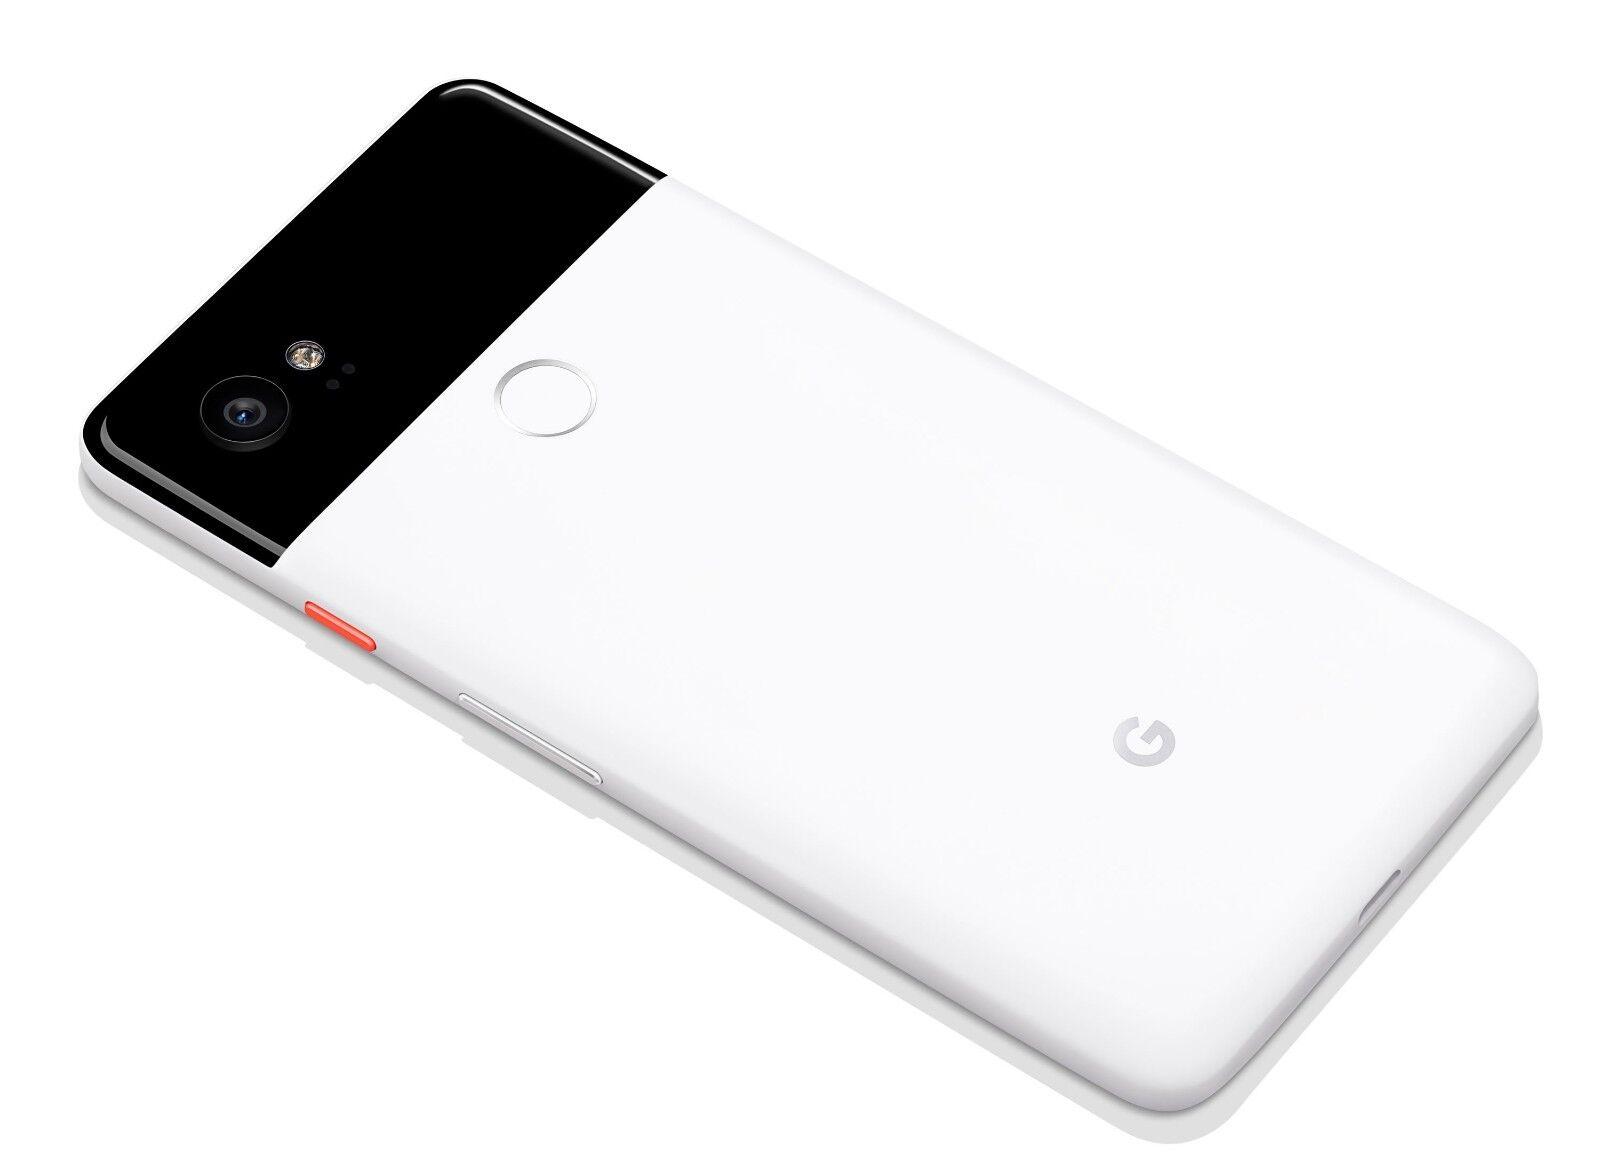 Google Pixel 2 - 64GB - White (Unlocked) Smartphone A - True